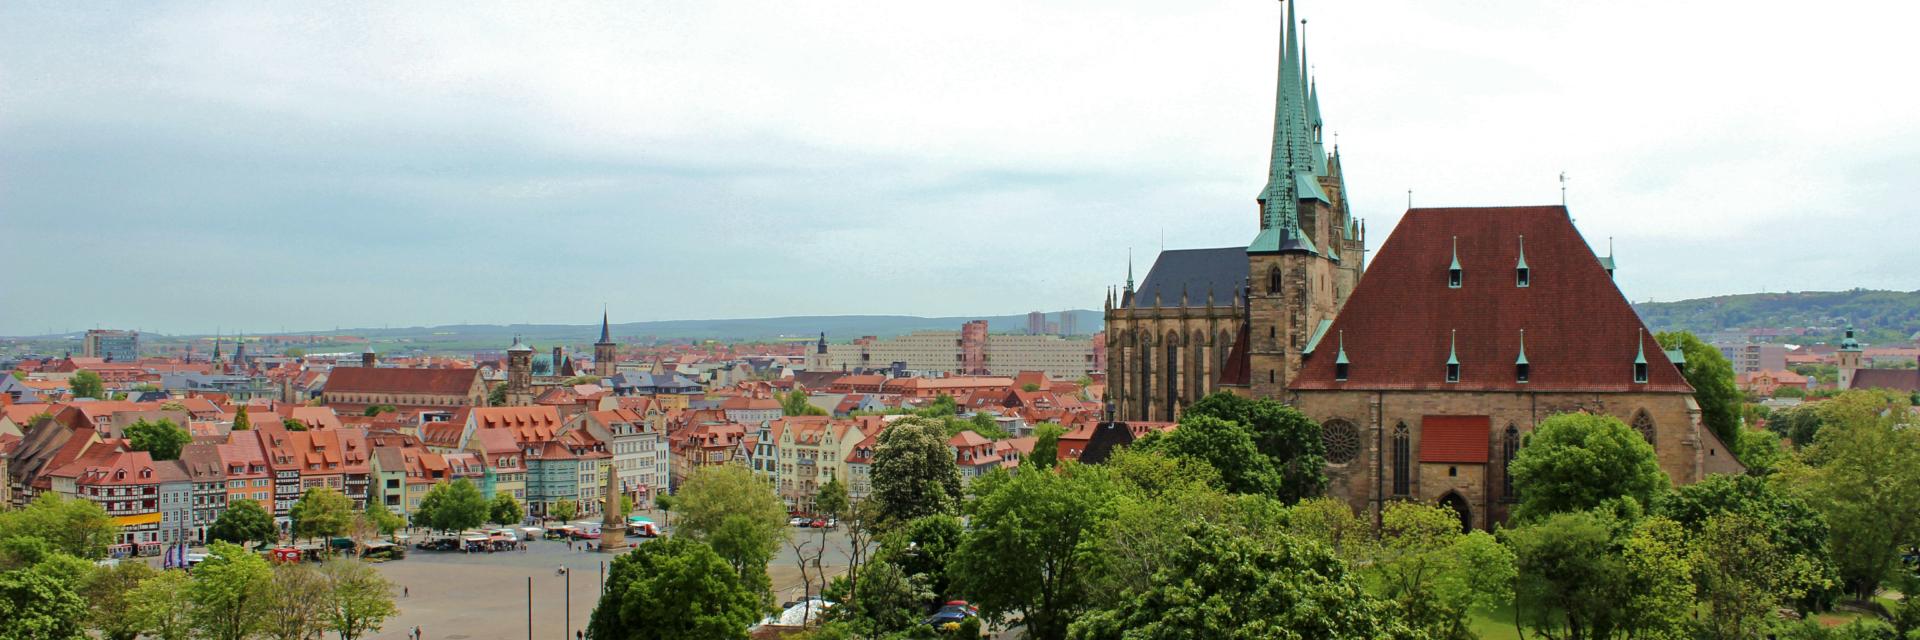 Blick vom Petersberg auf den Erfurter Dom